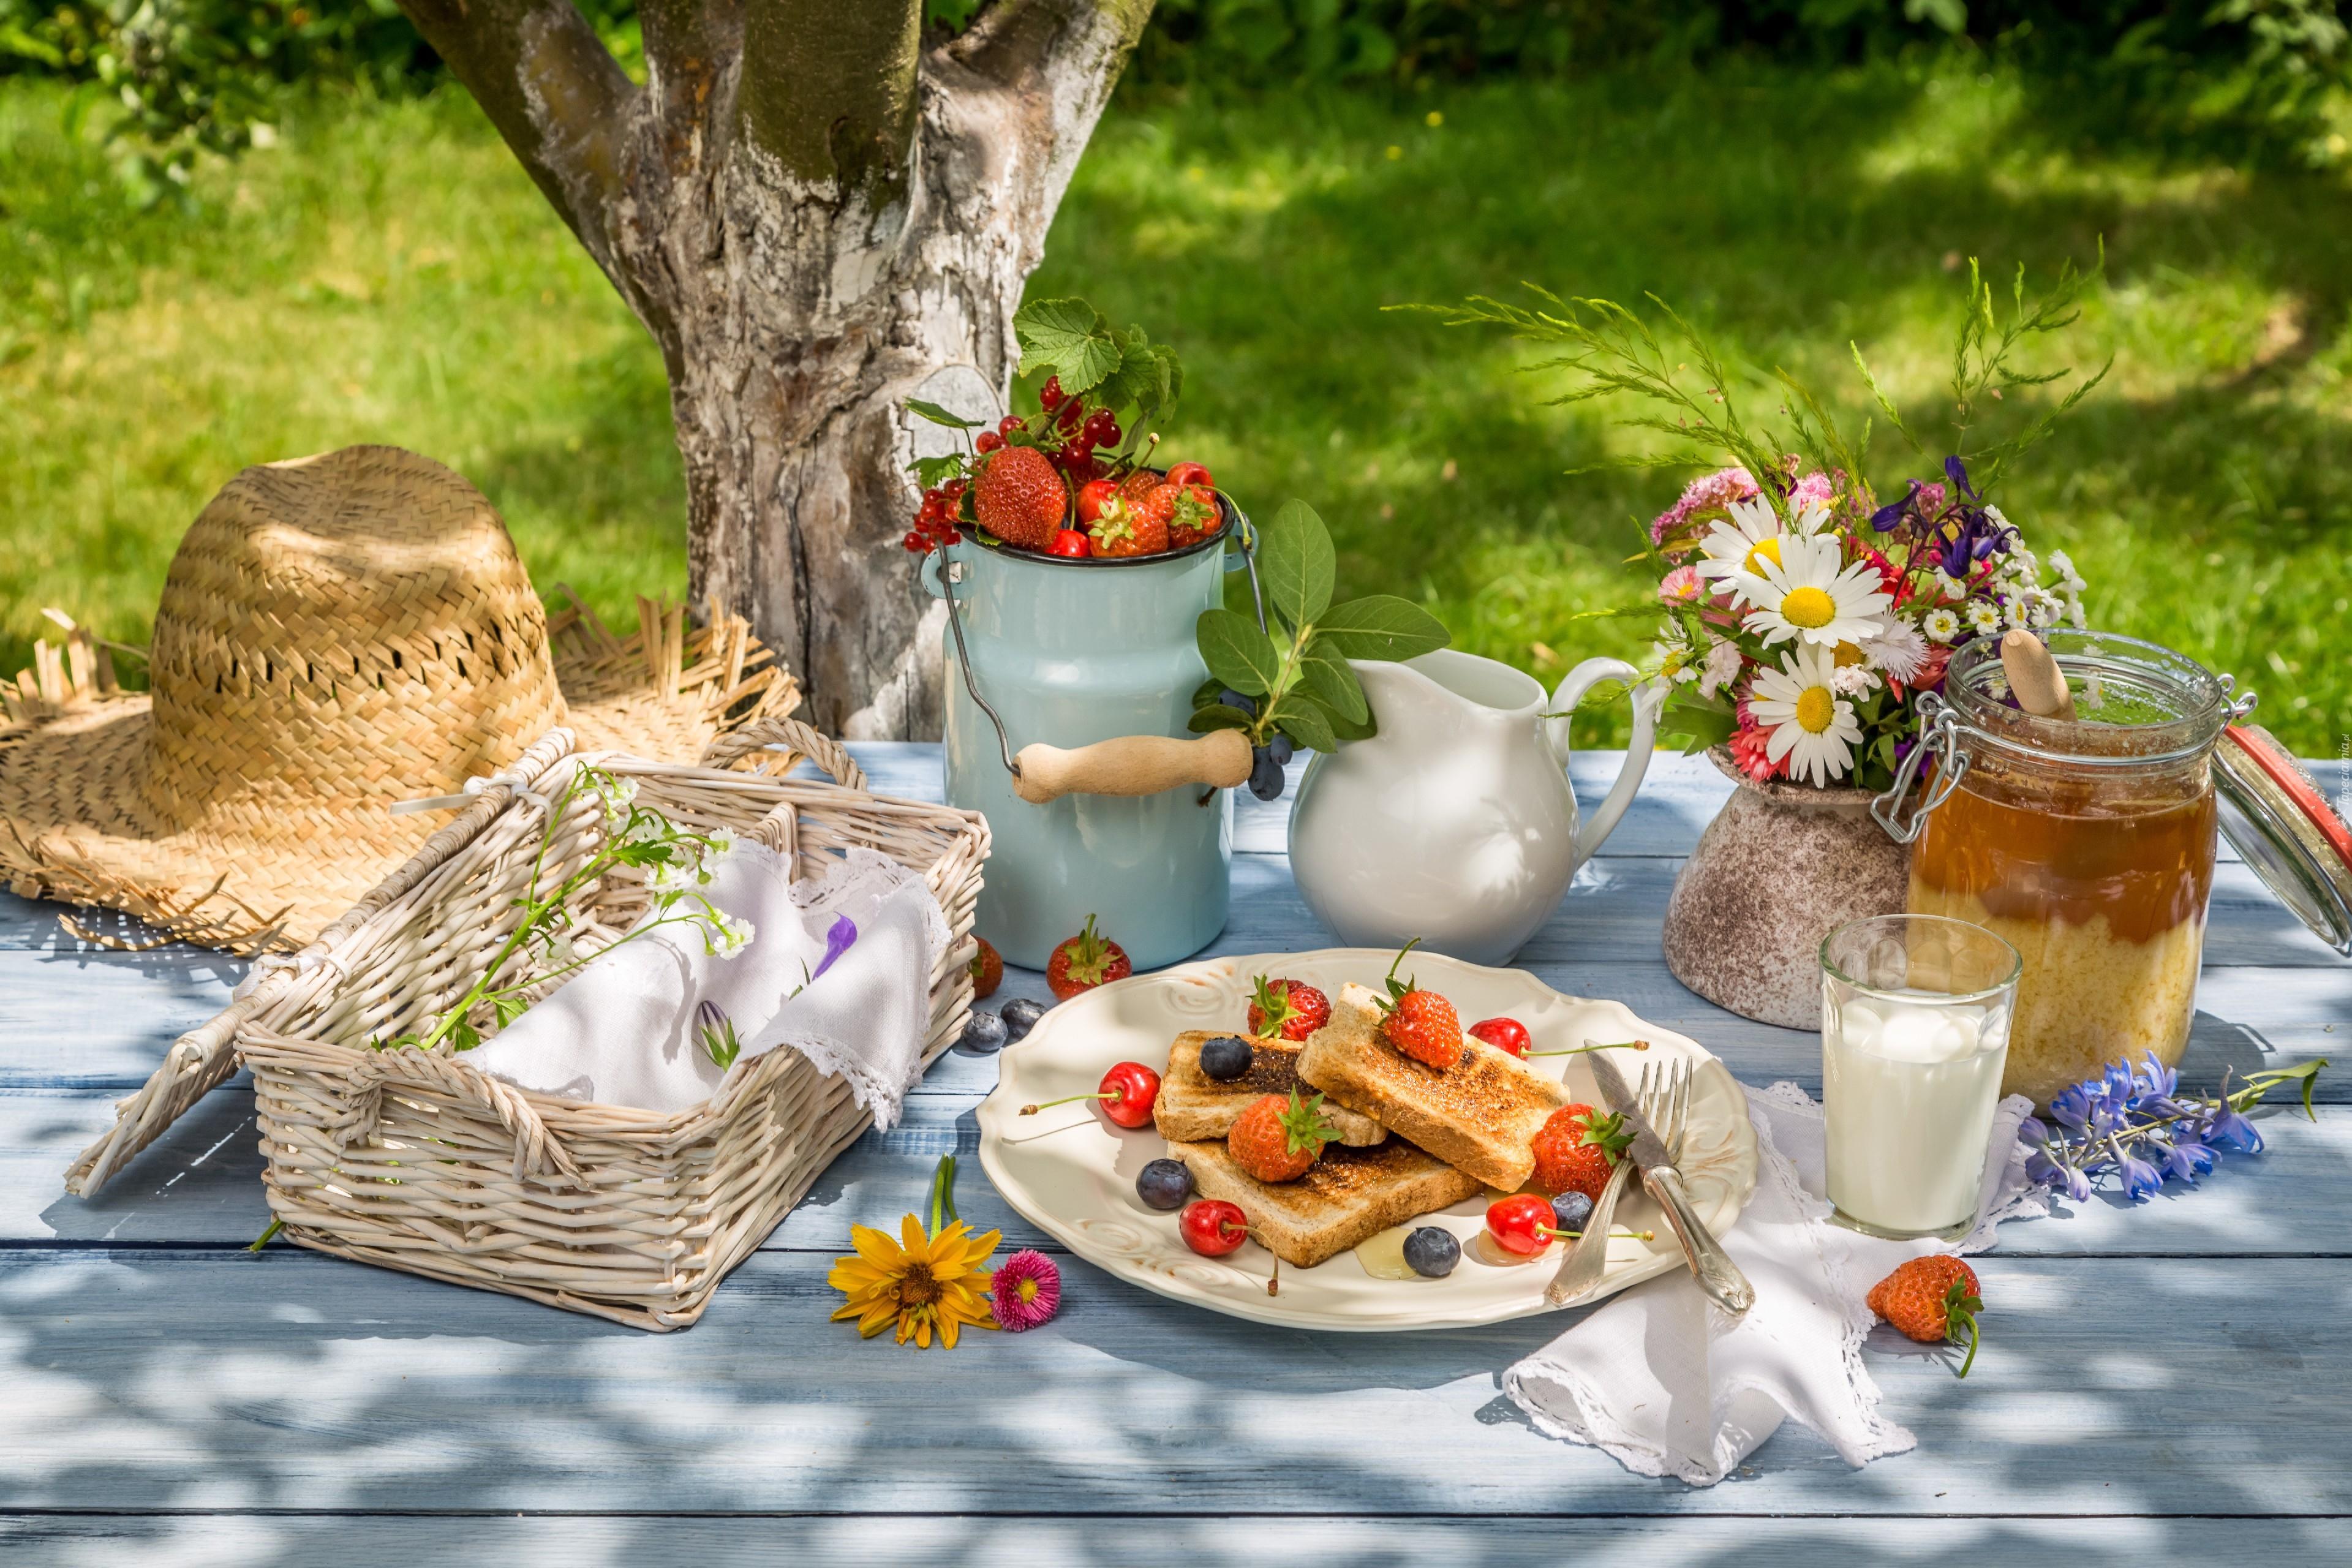 домов завтрак на природе фото семье